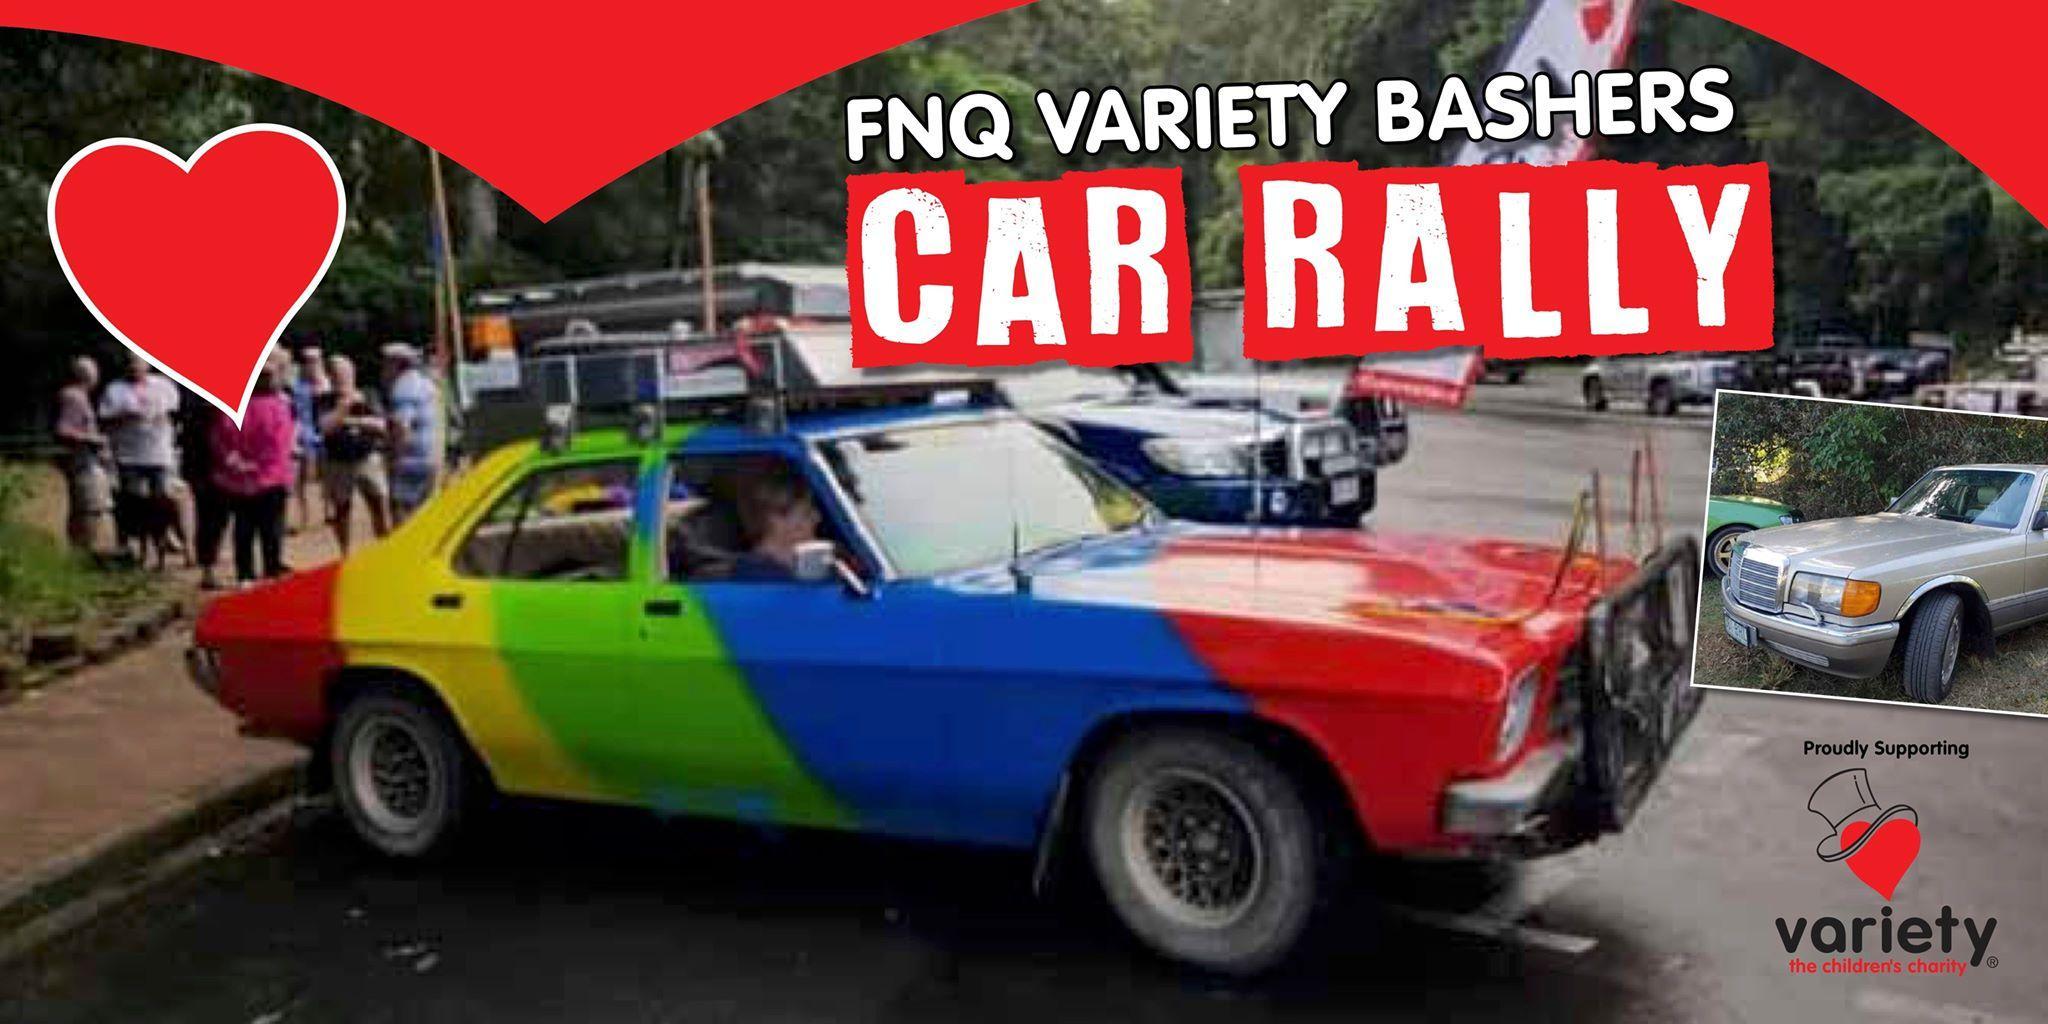 FNQ VARIETY BASHERS CAR RALLY